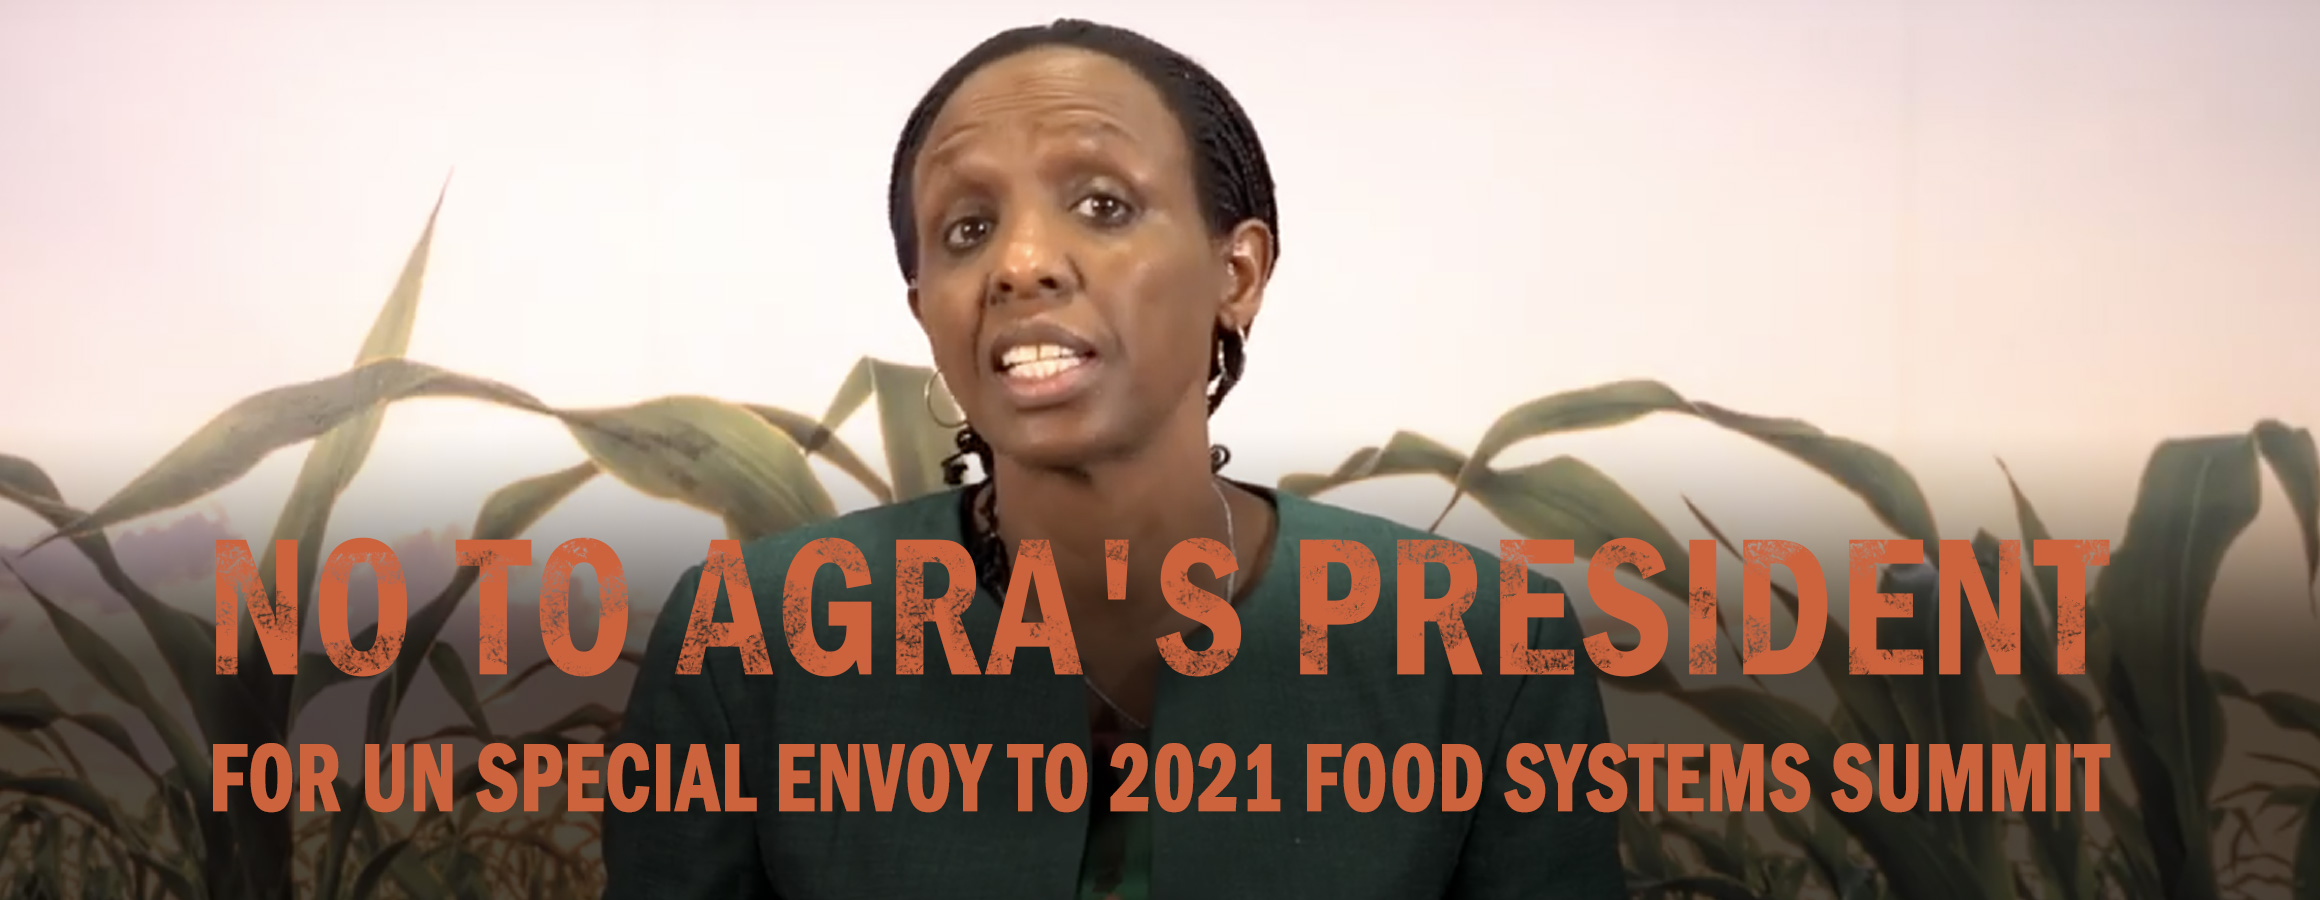 Screenshot from AGRA Harvest's February 6, 2020 video